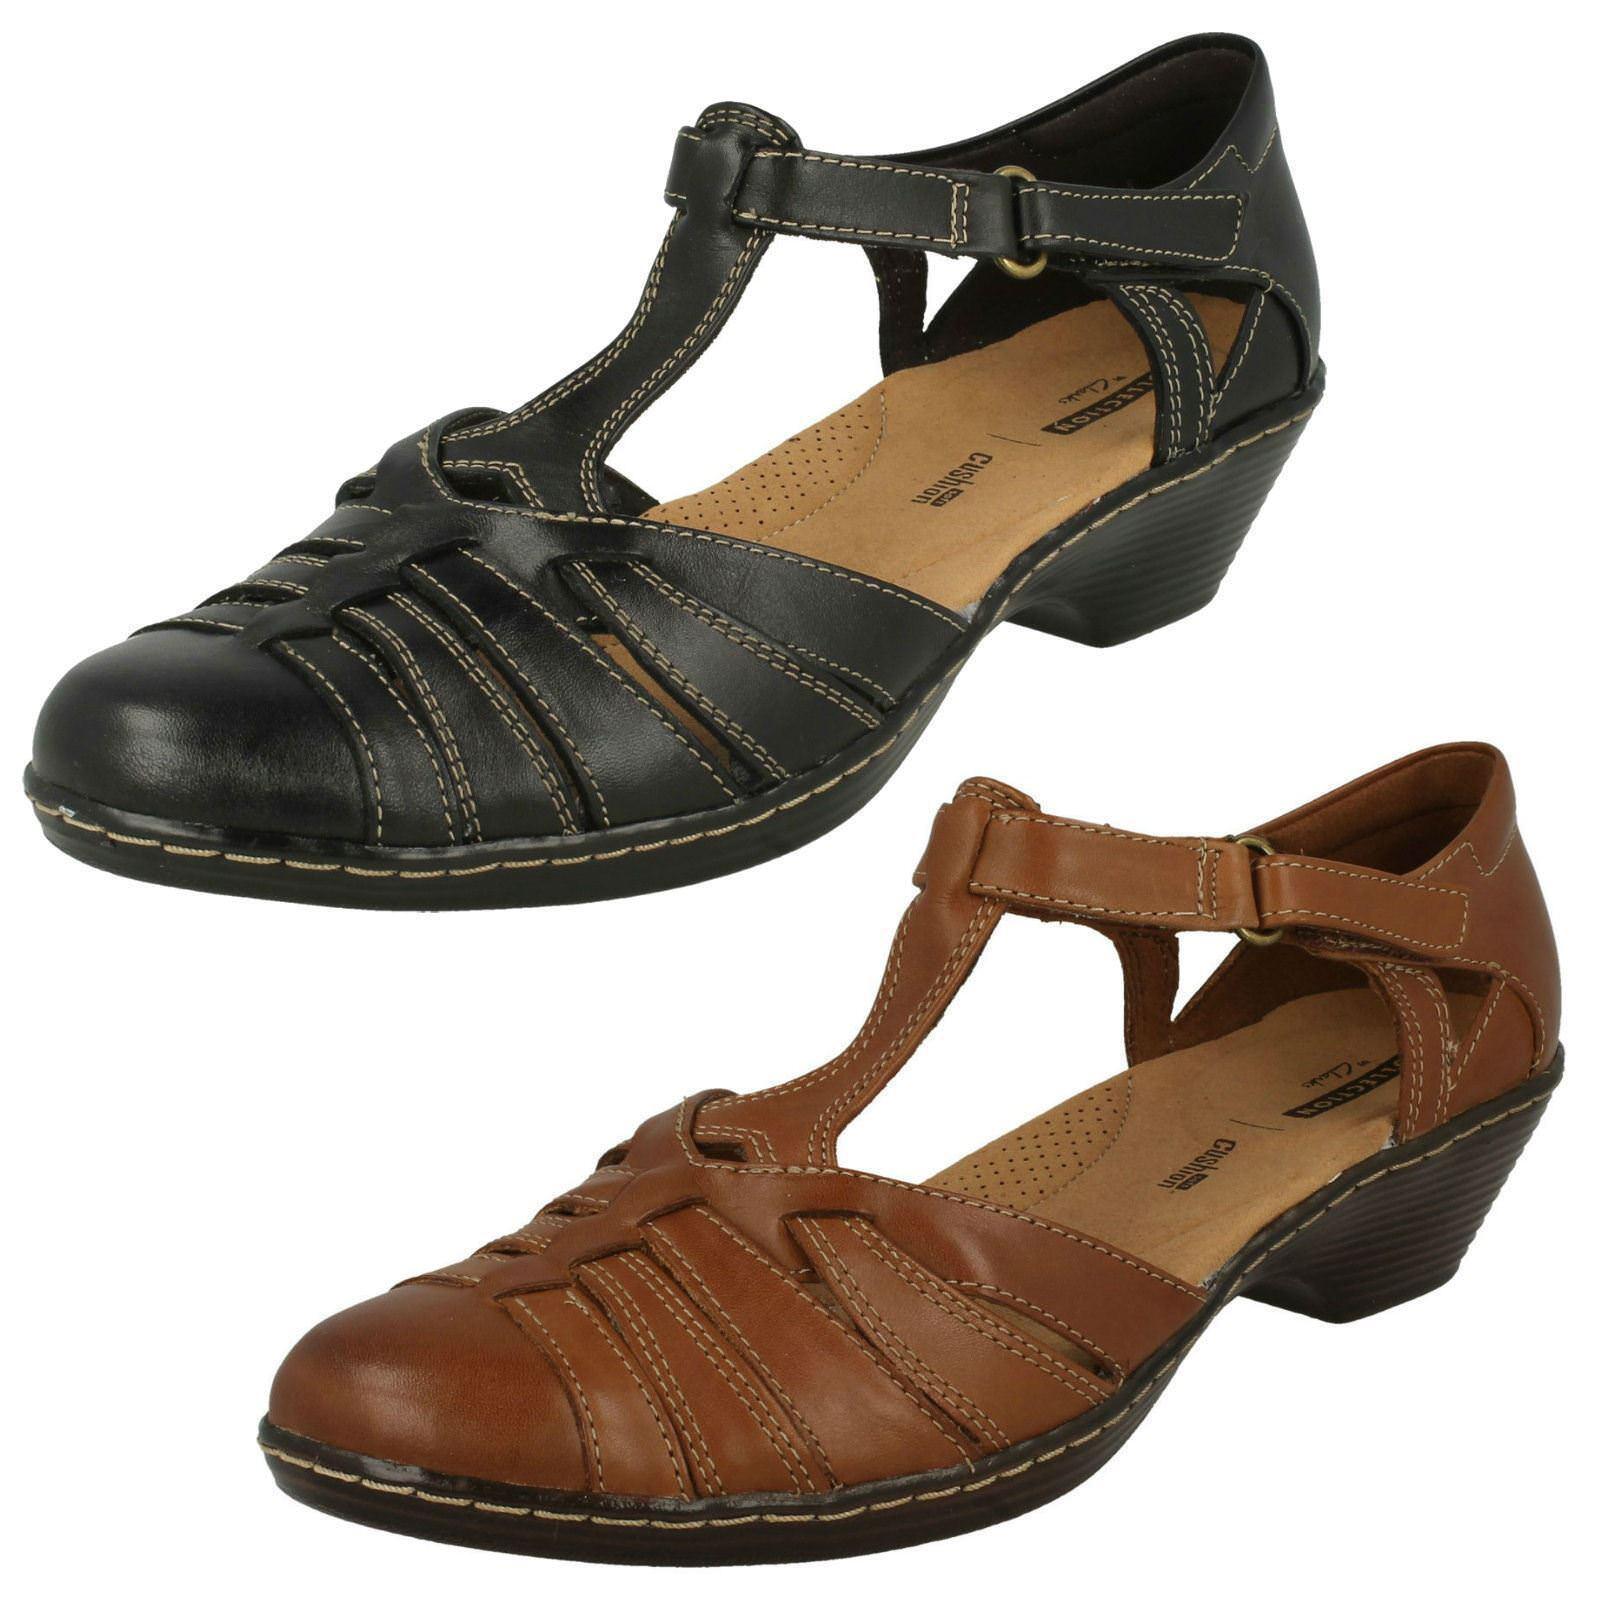 Damen D D D Passen Wendy Alto Sommer Schuhe von Clarks  | Export  914b44